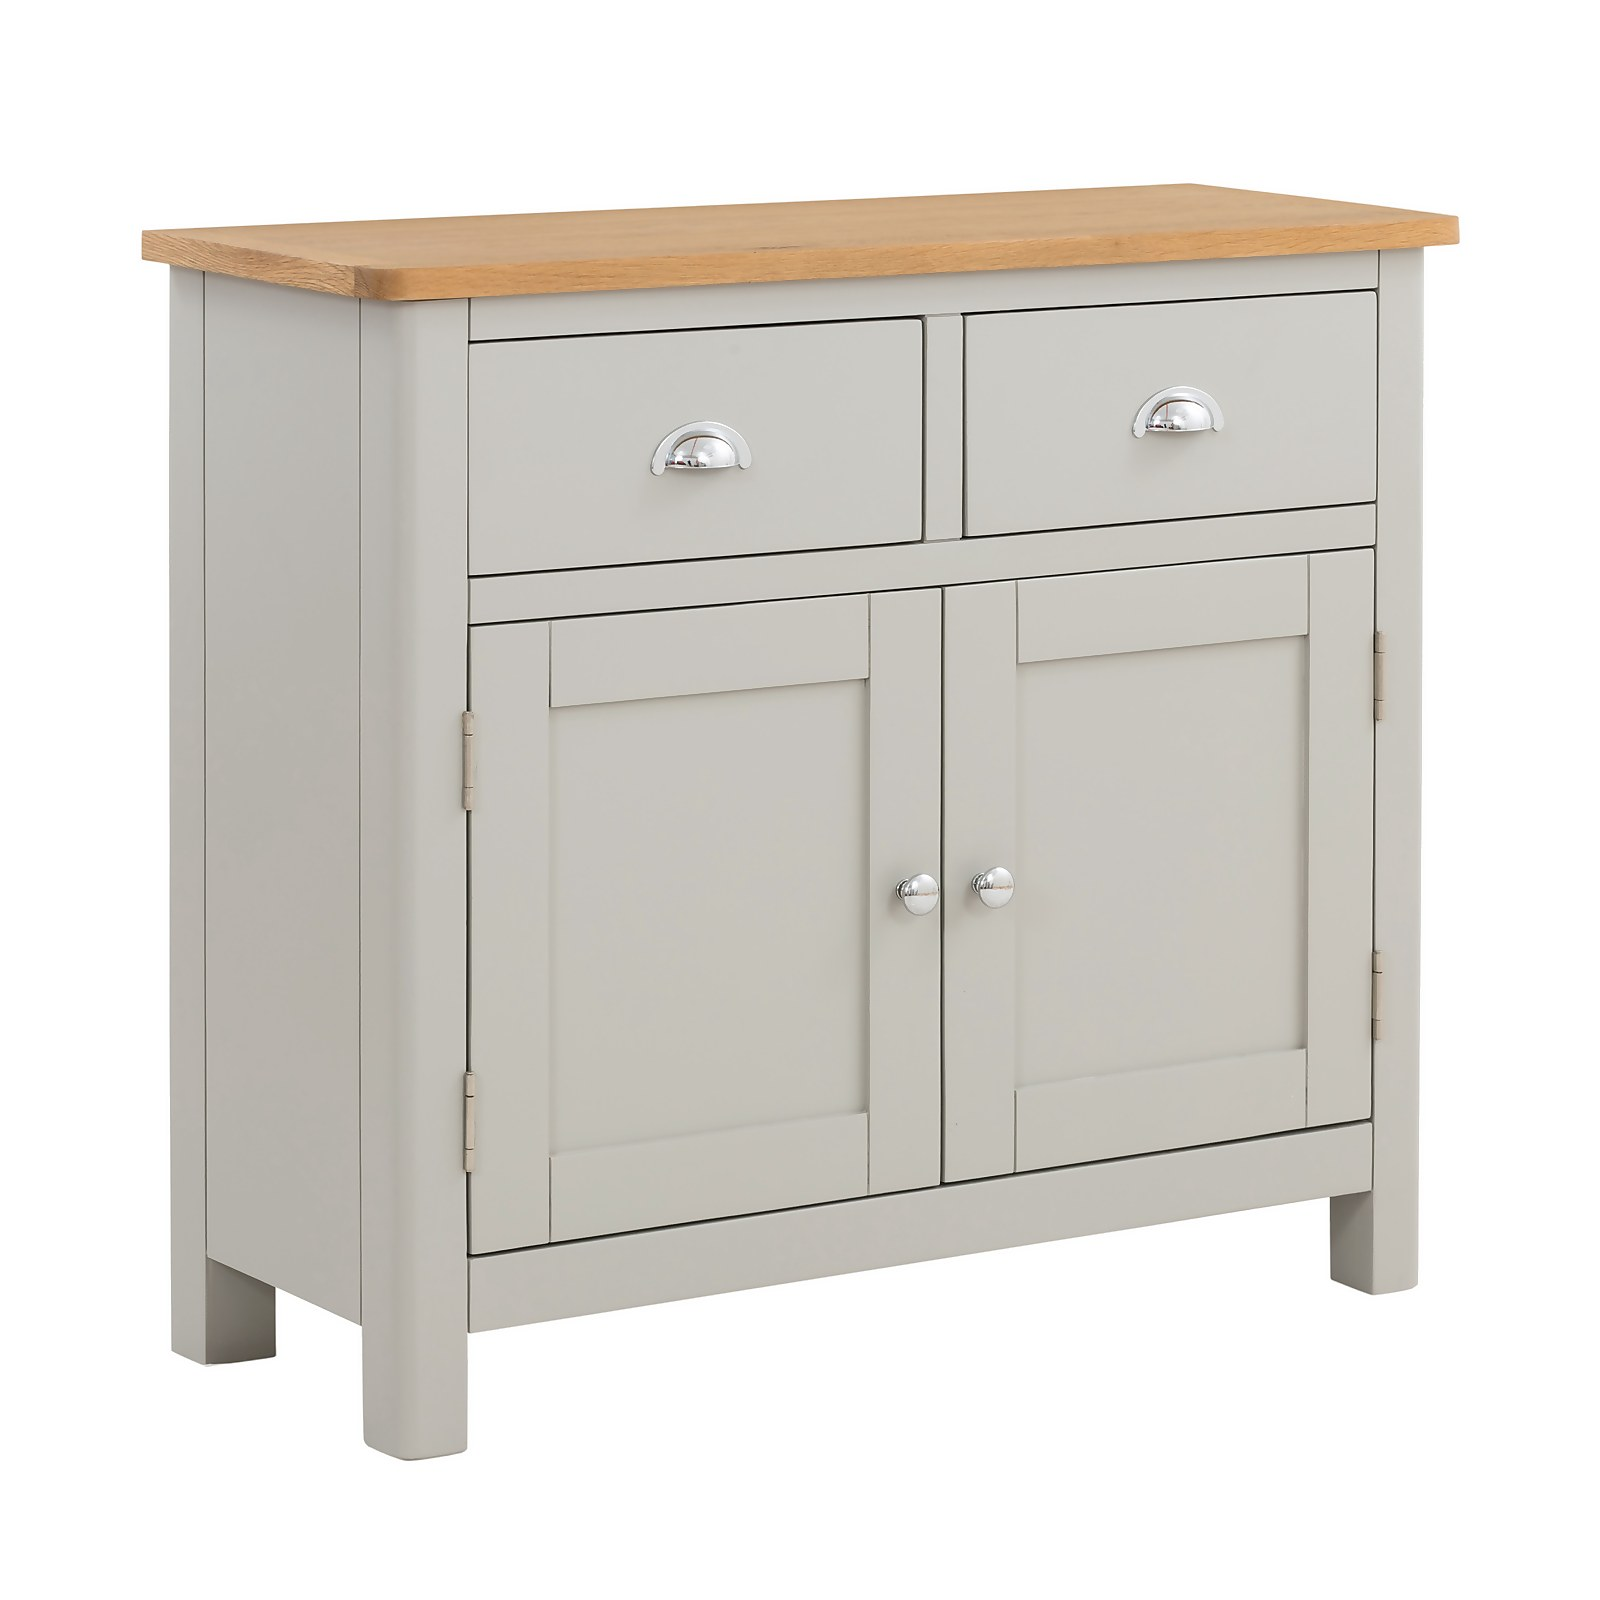 Norbury Small Sideboard - Grey